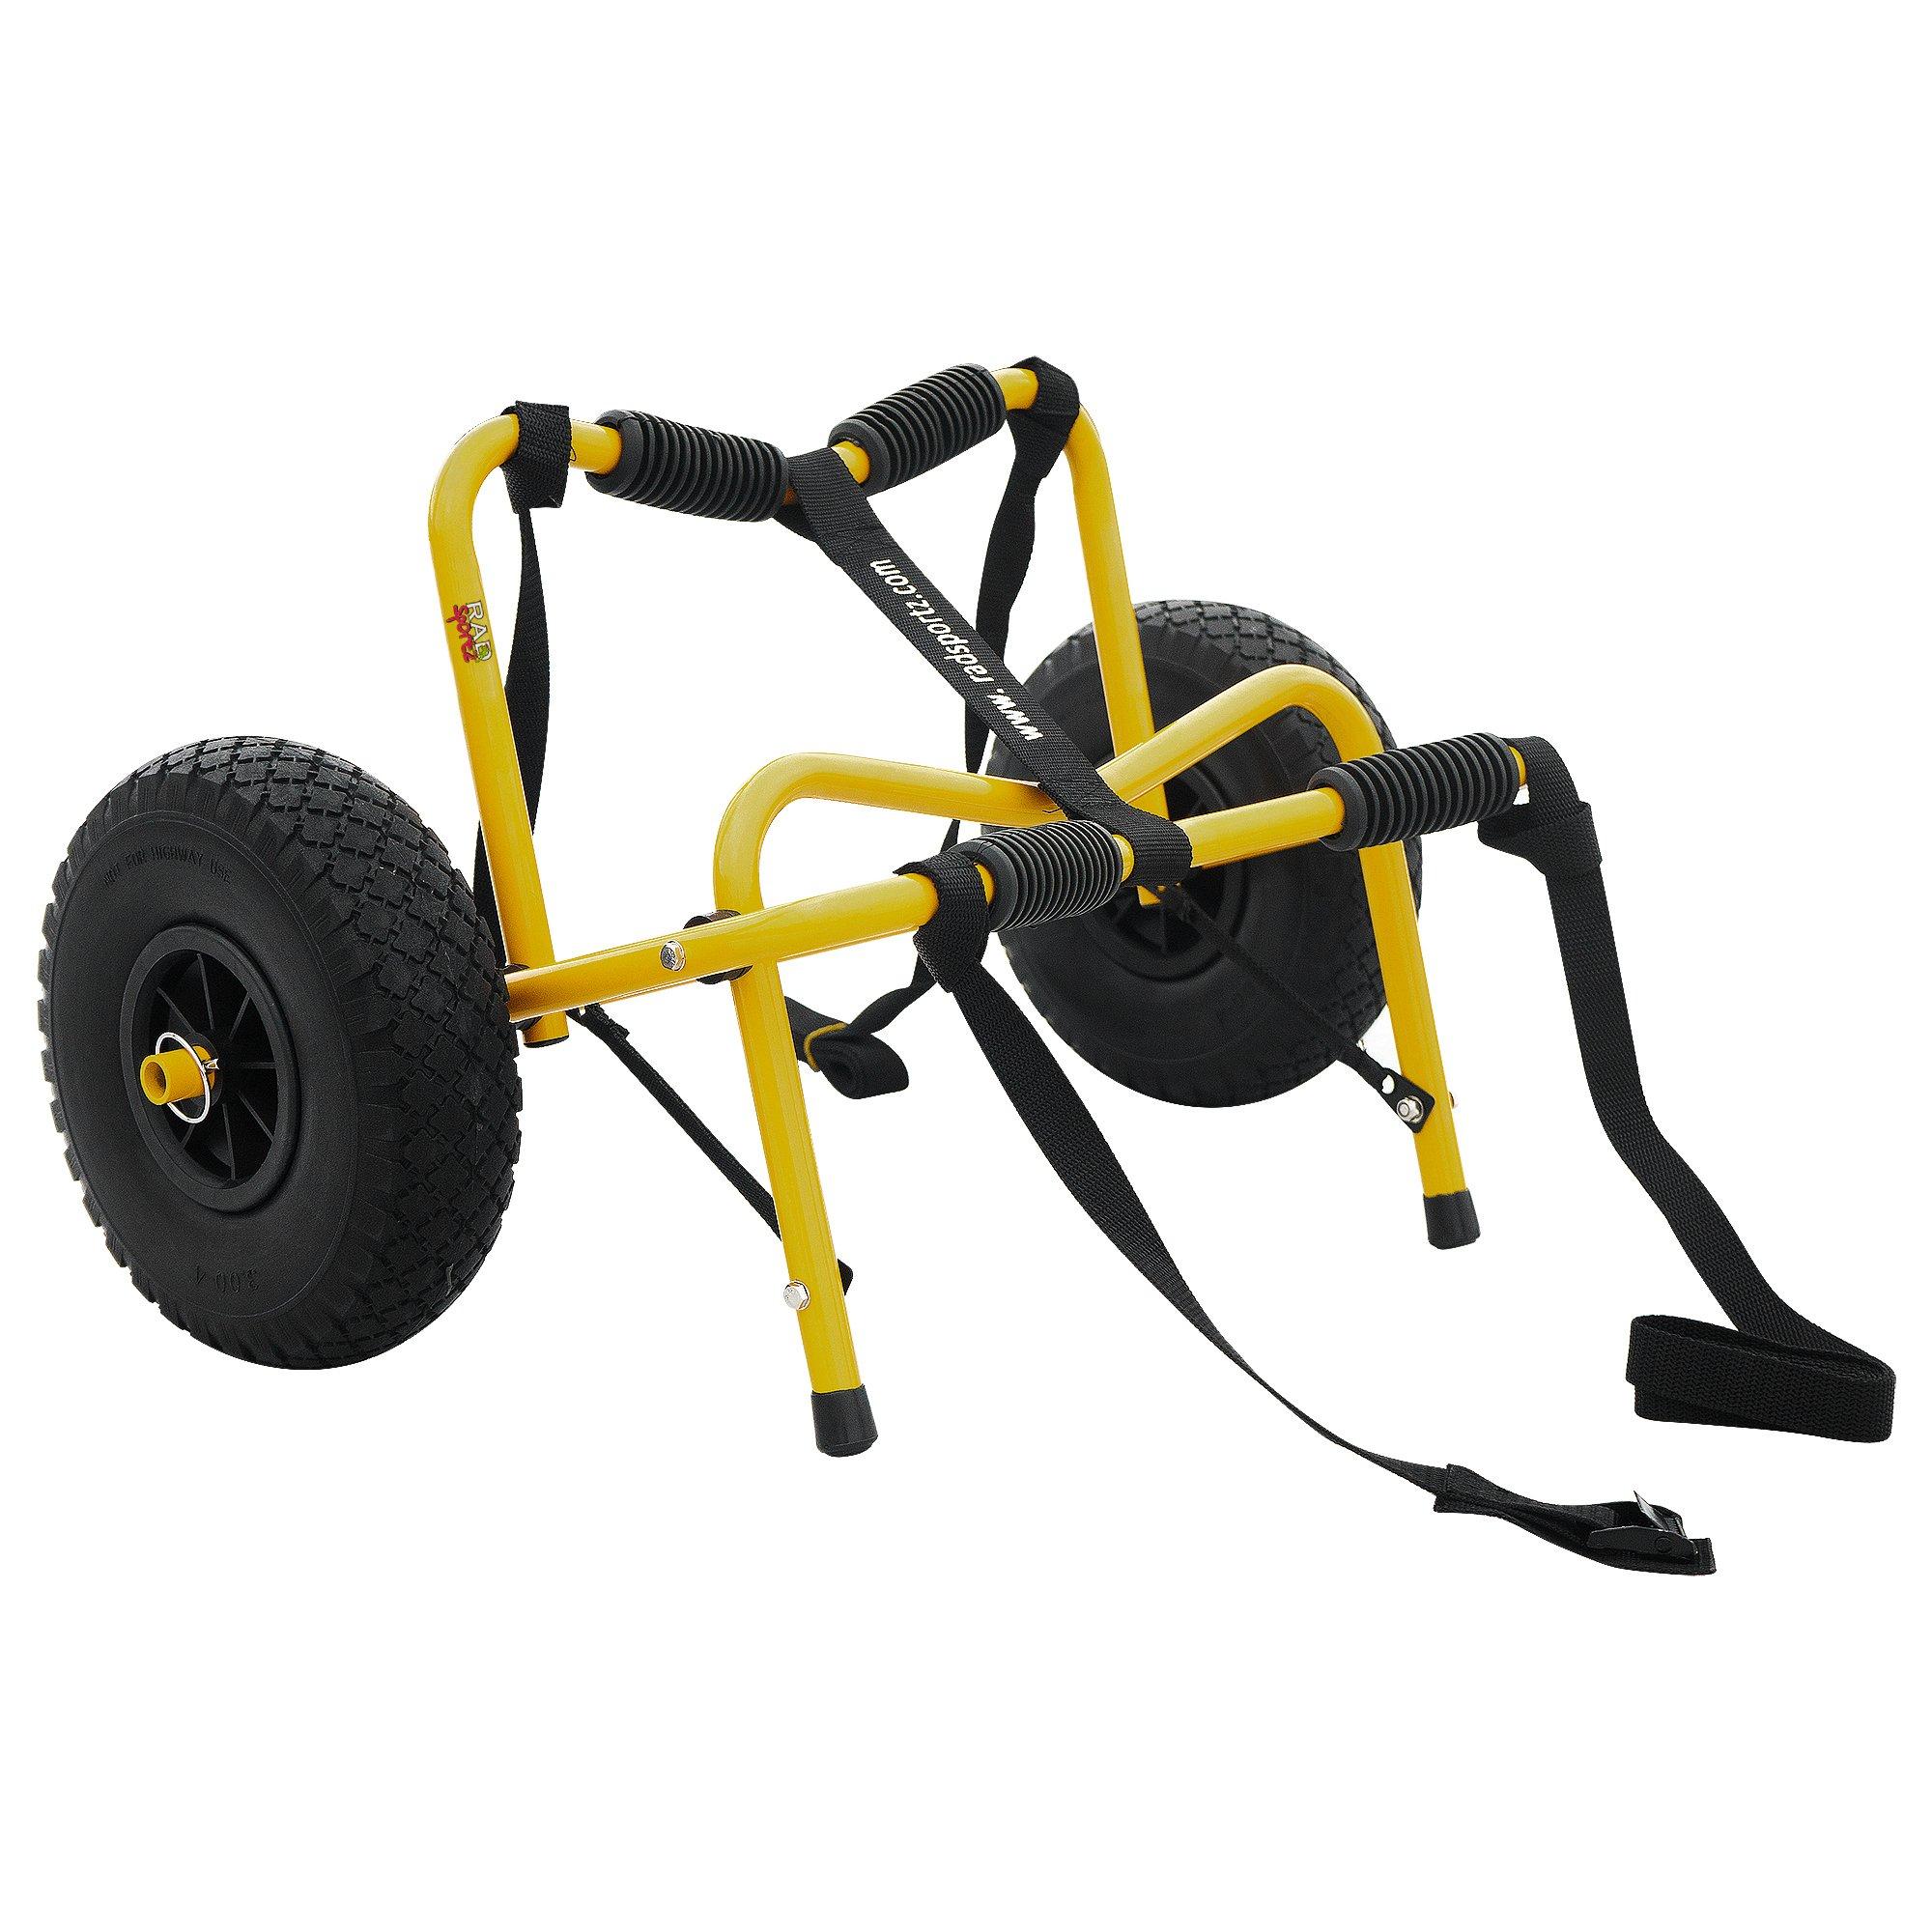 RAD Sportz Kayak Trolley Pro Premium Kayak Cart with NO-FLAT Airless Tires 150 LB Capacity Yellow with Free Mesh Carry Bag